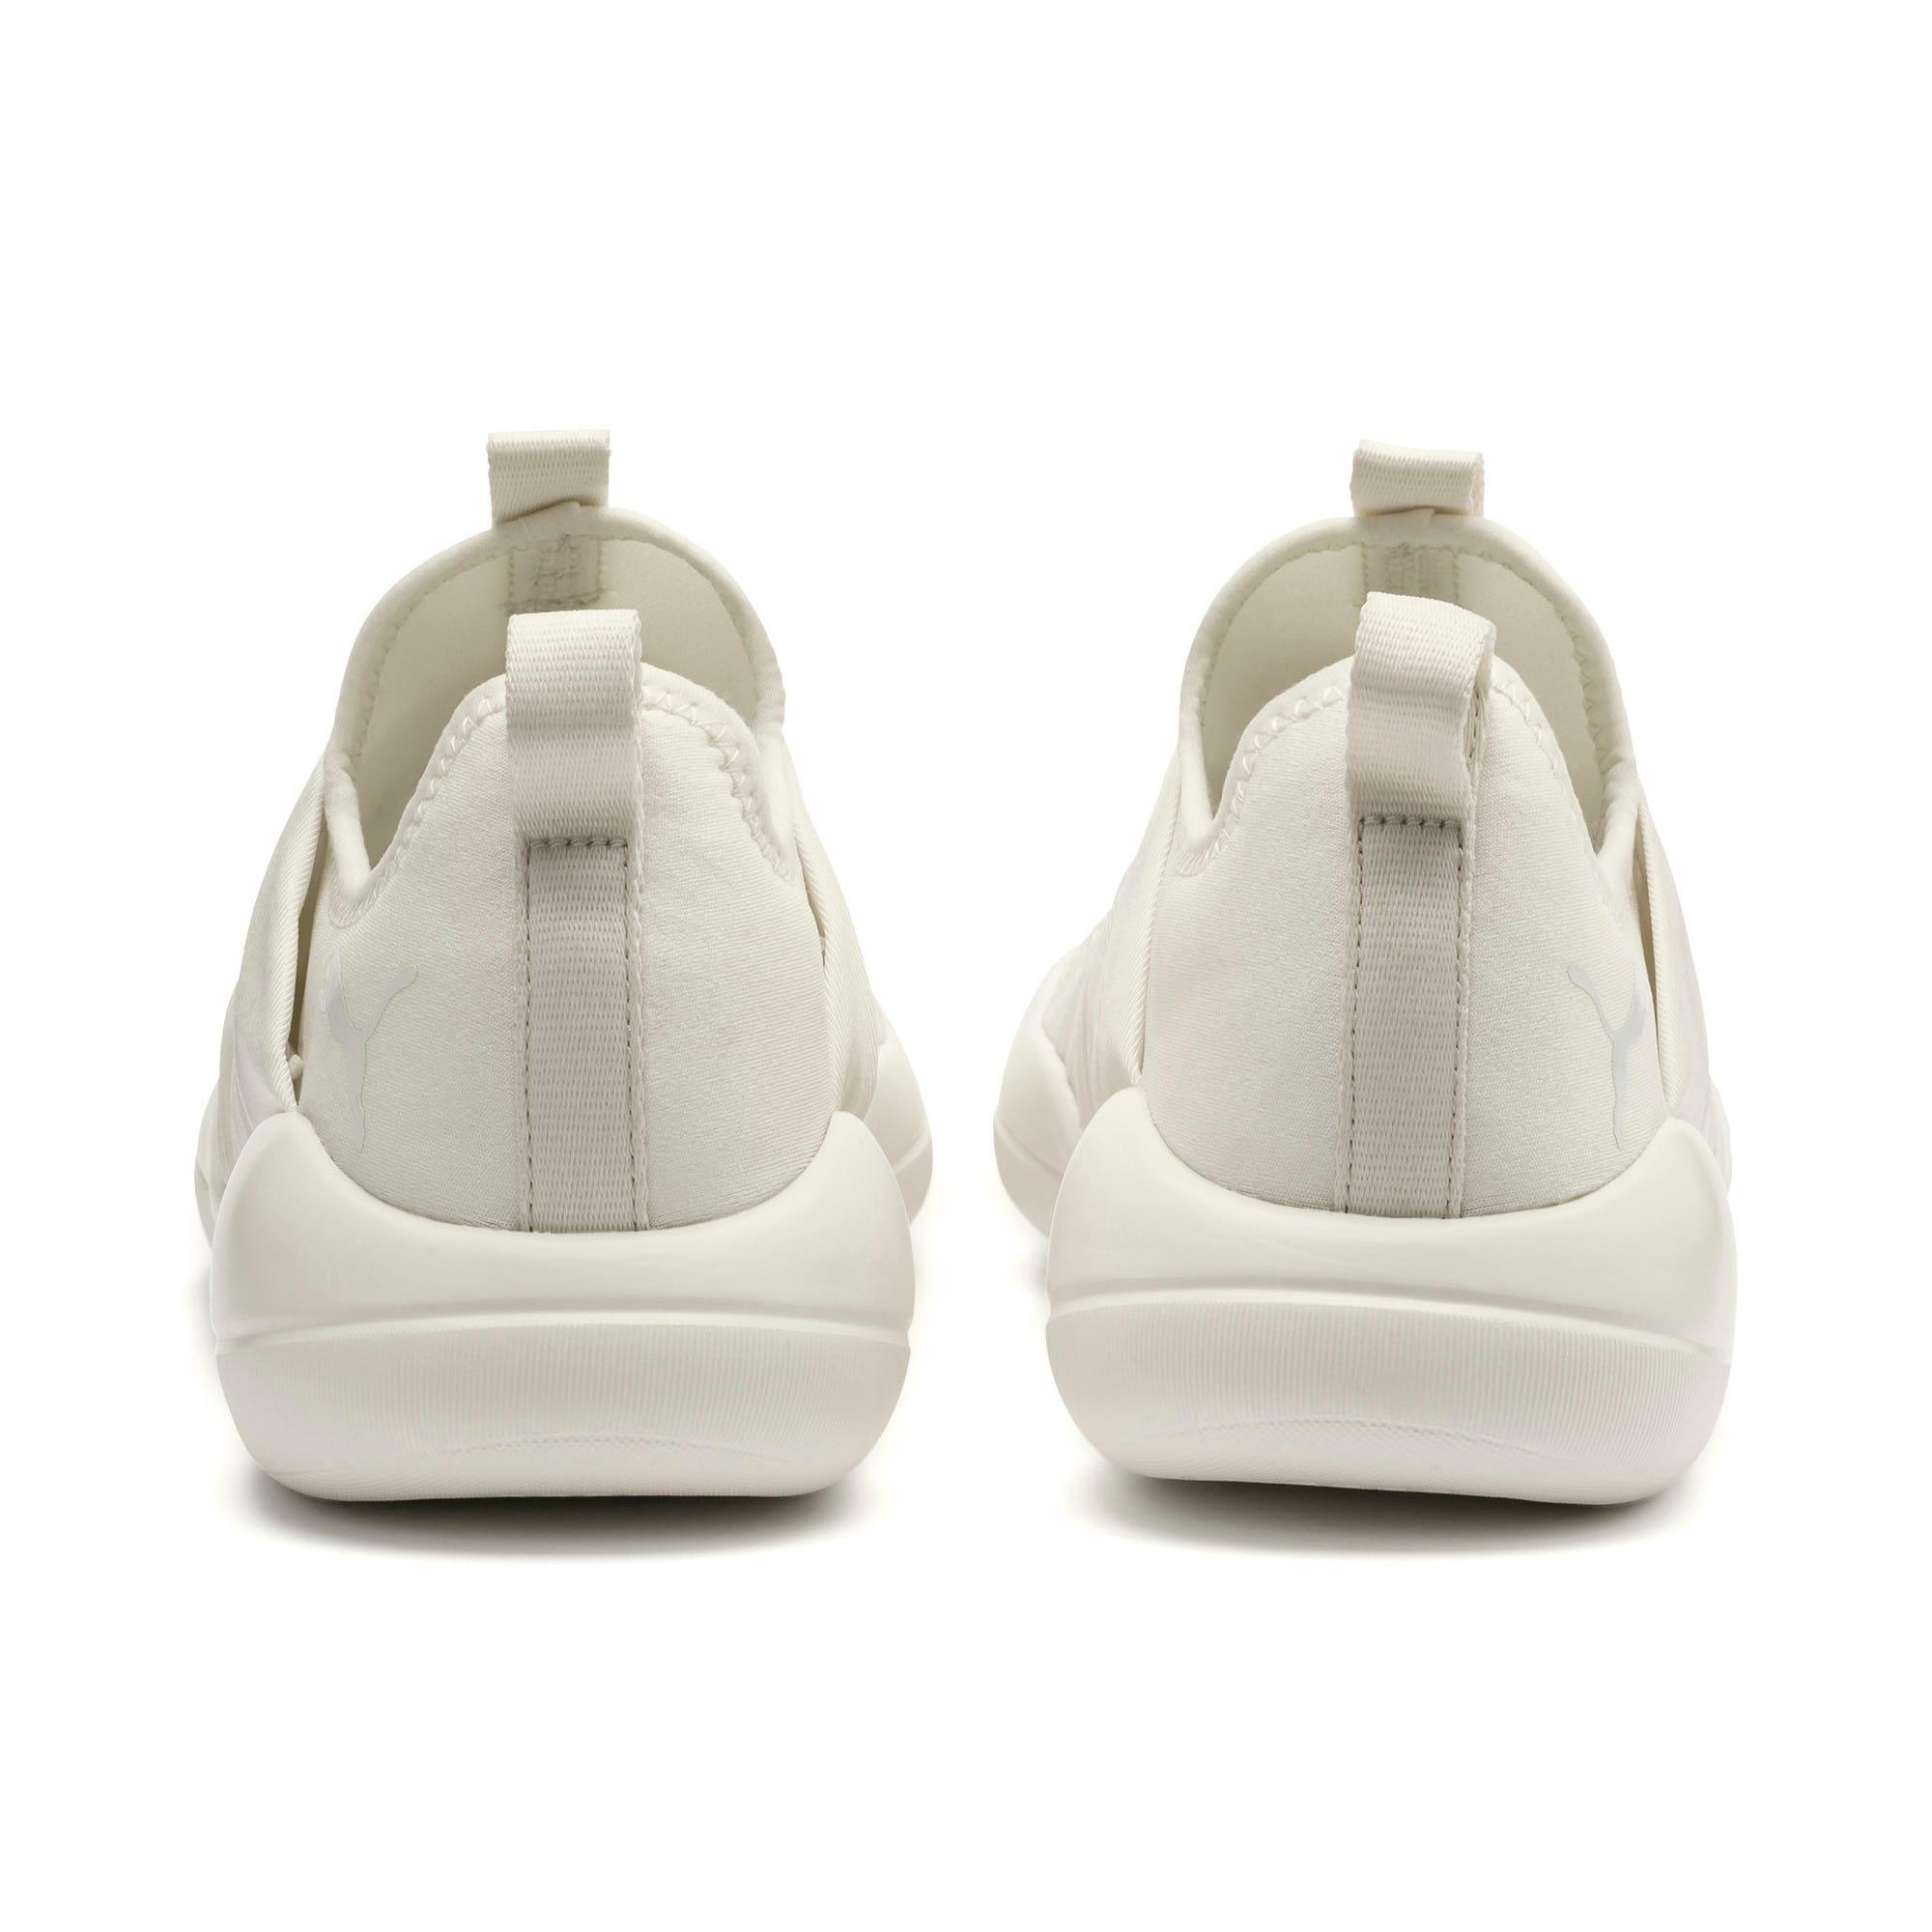 Thumbnail 4 of Flourish Women's Training Shoes, Whisper White-Puma White, medium